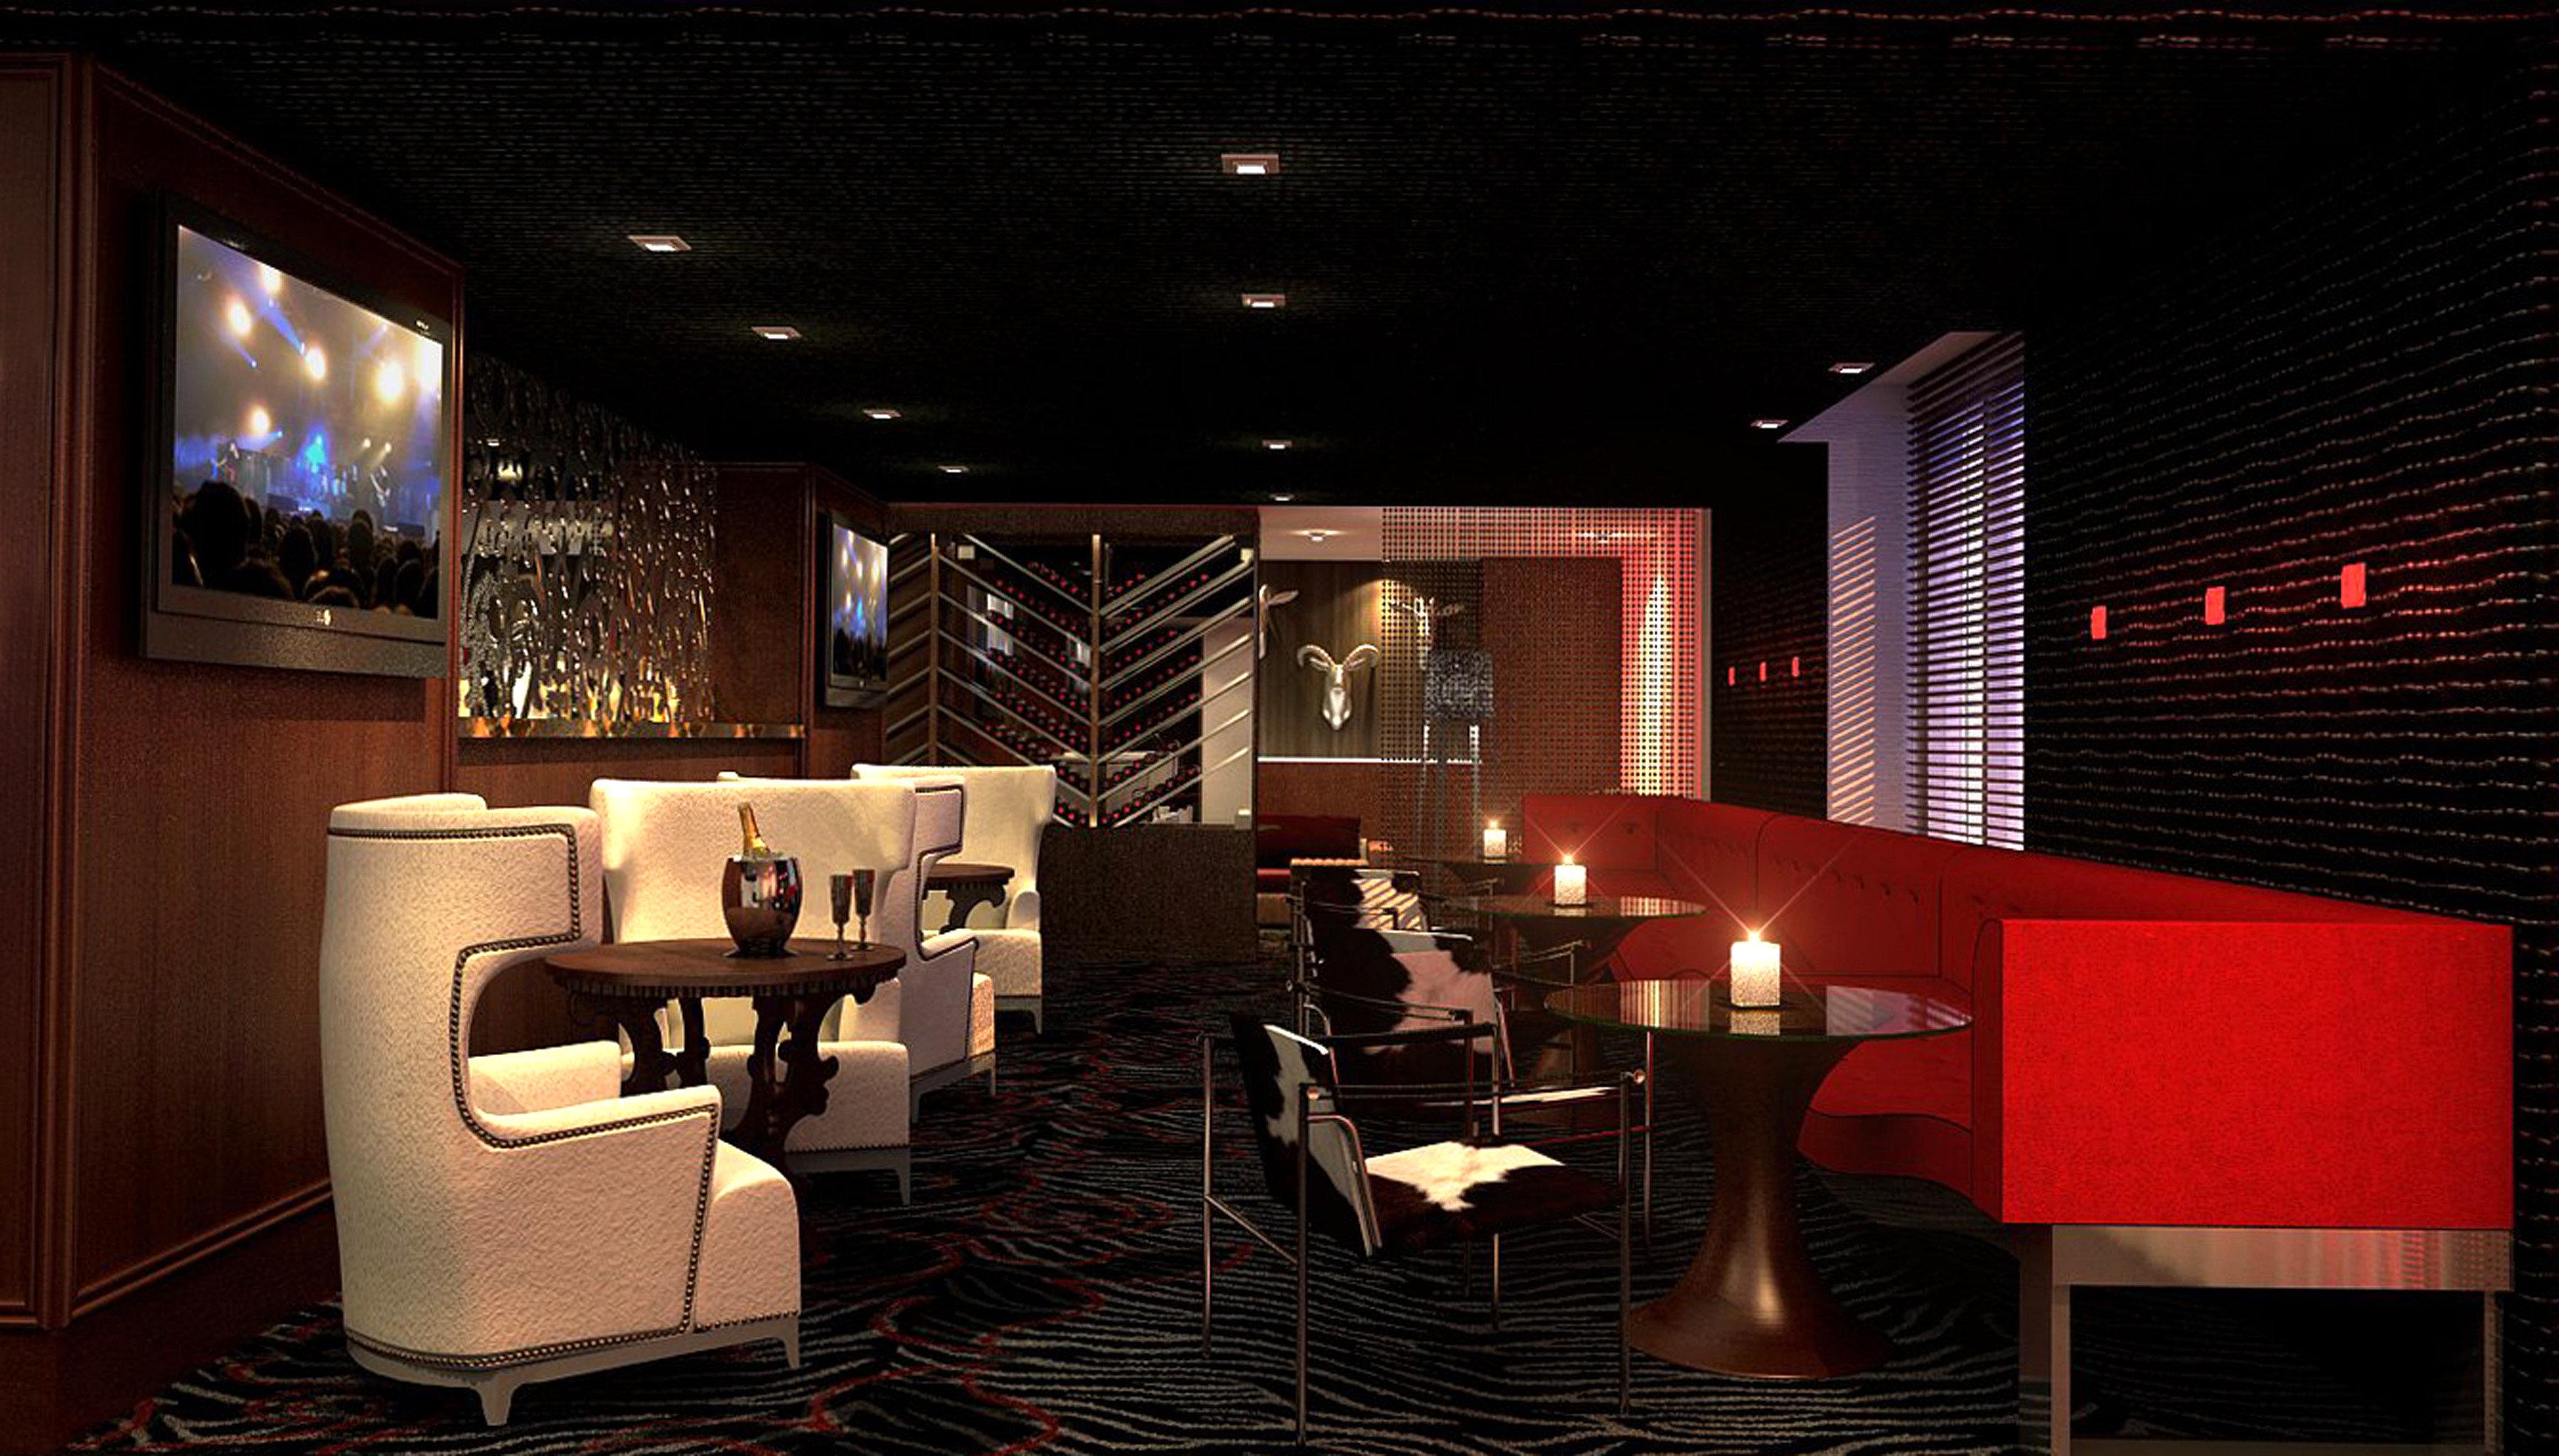 Bar City Drink Modern Lobby lighting living room theatre night